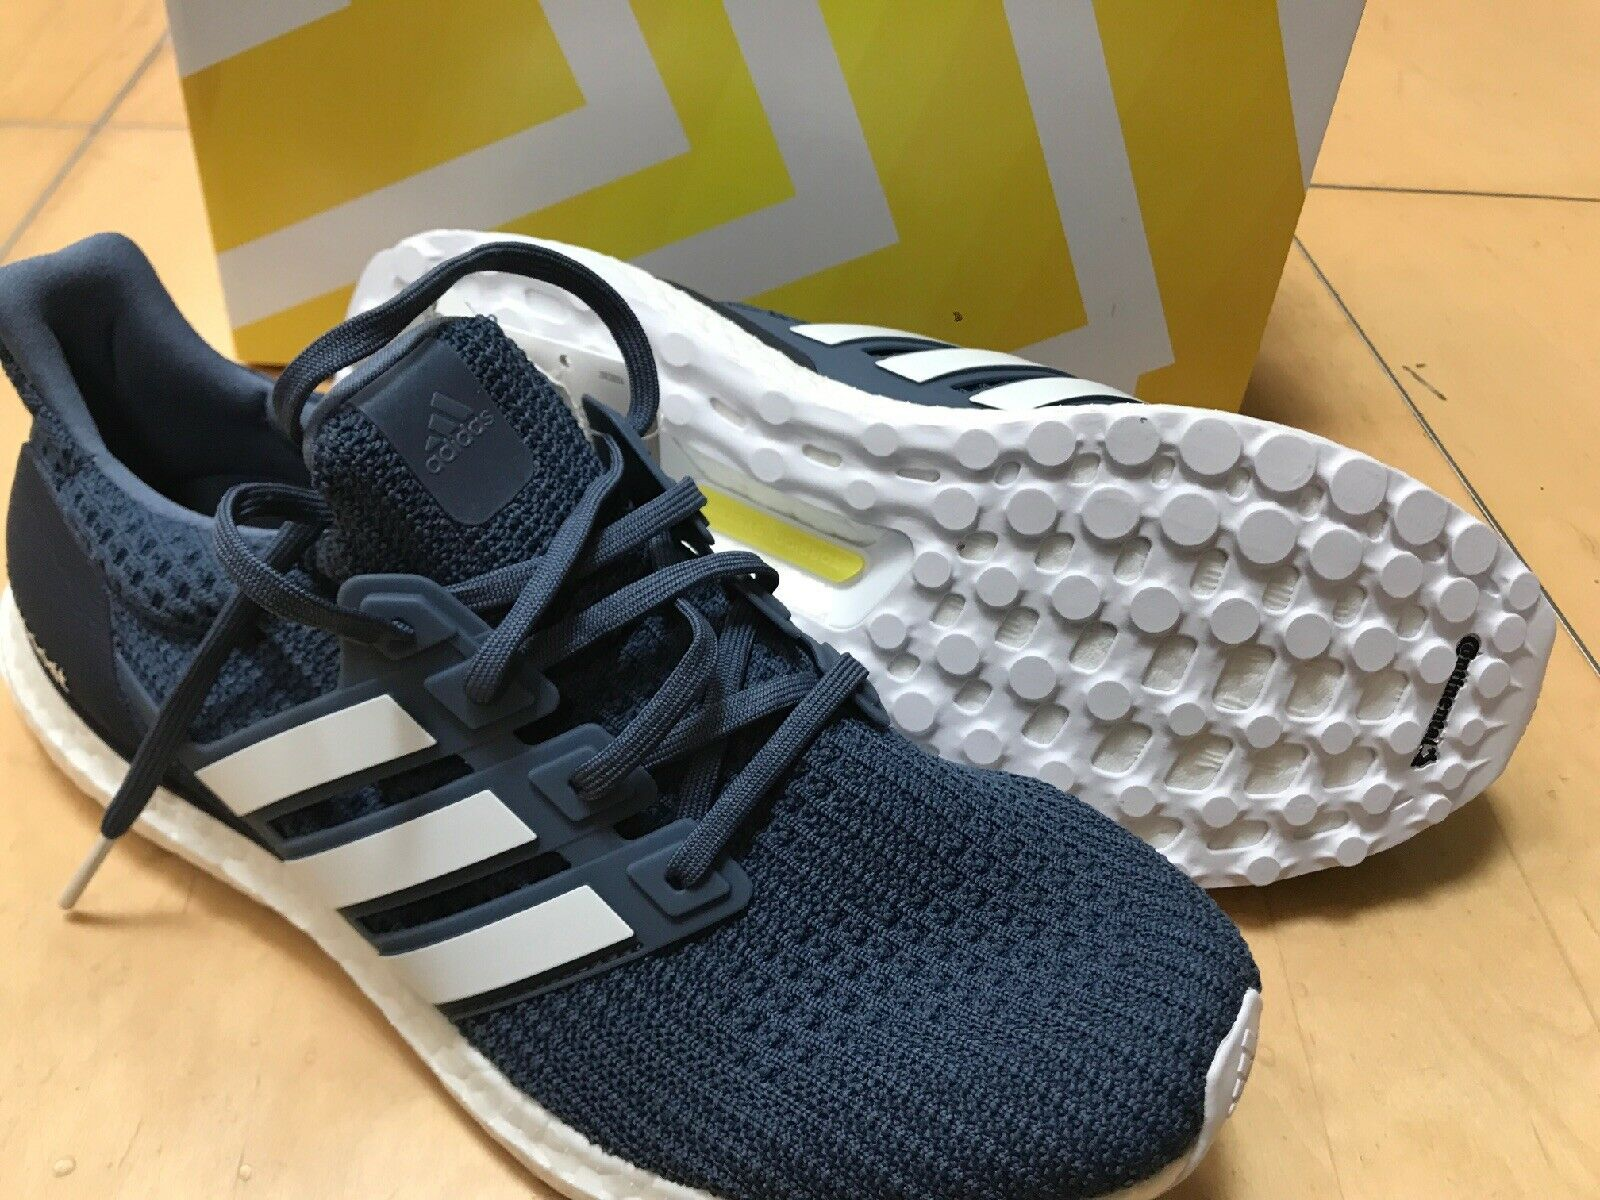 Adidas Ultra Boost mannen disputen 65533;655533shardlopen schoenen afmeting 8.5 Nieuw